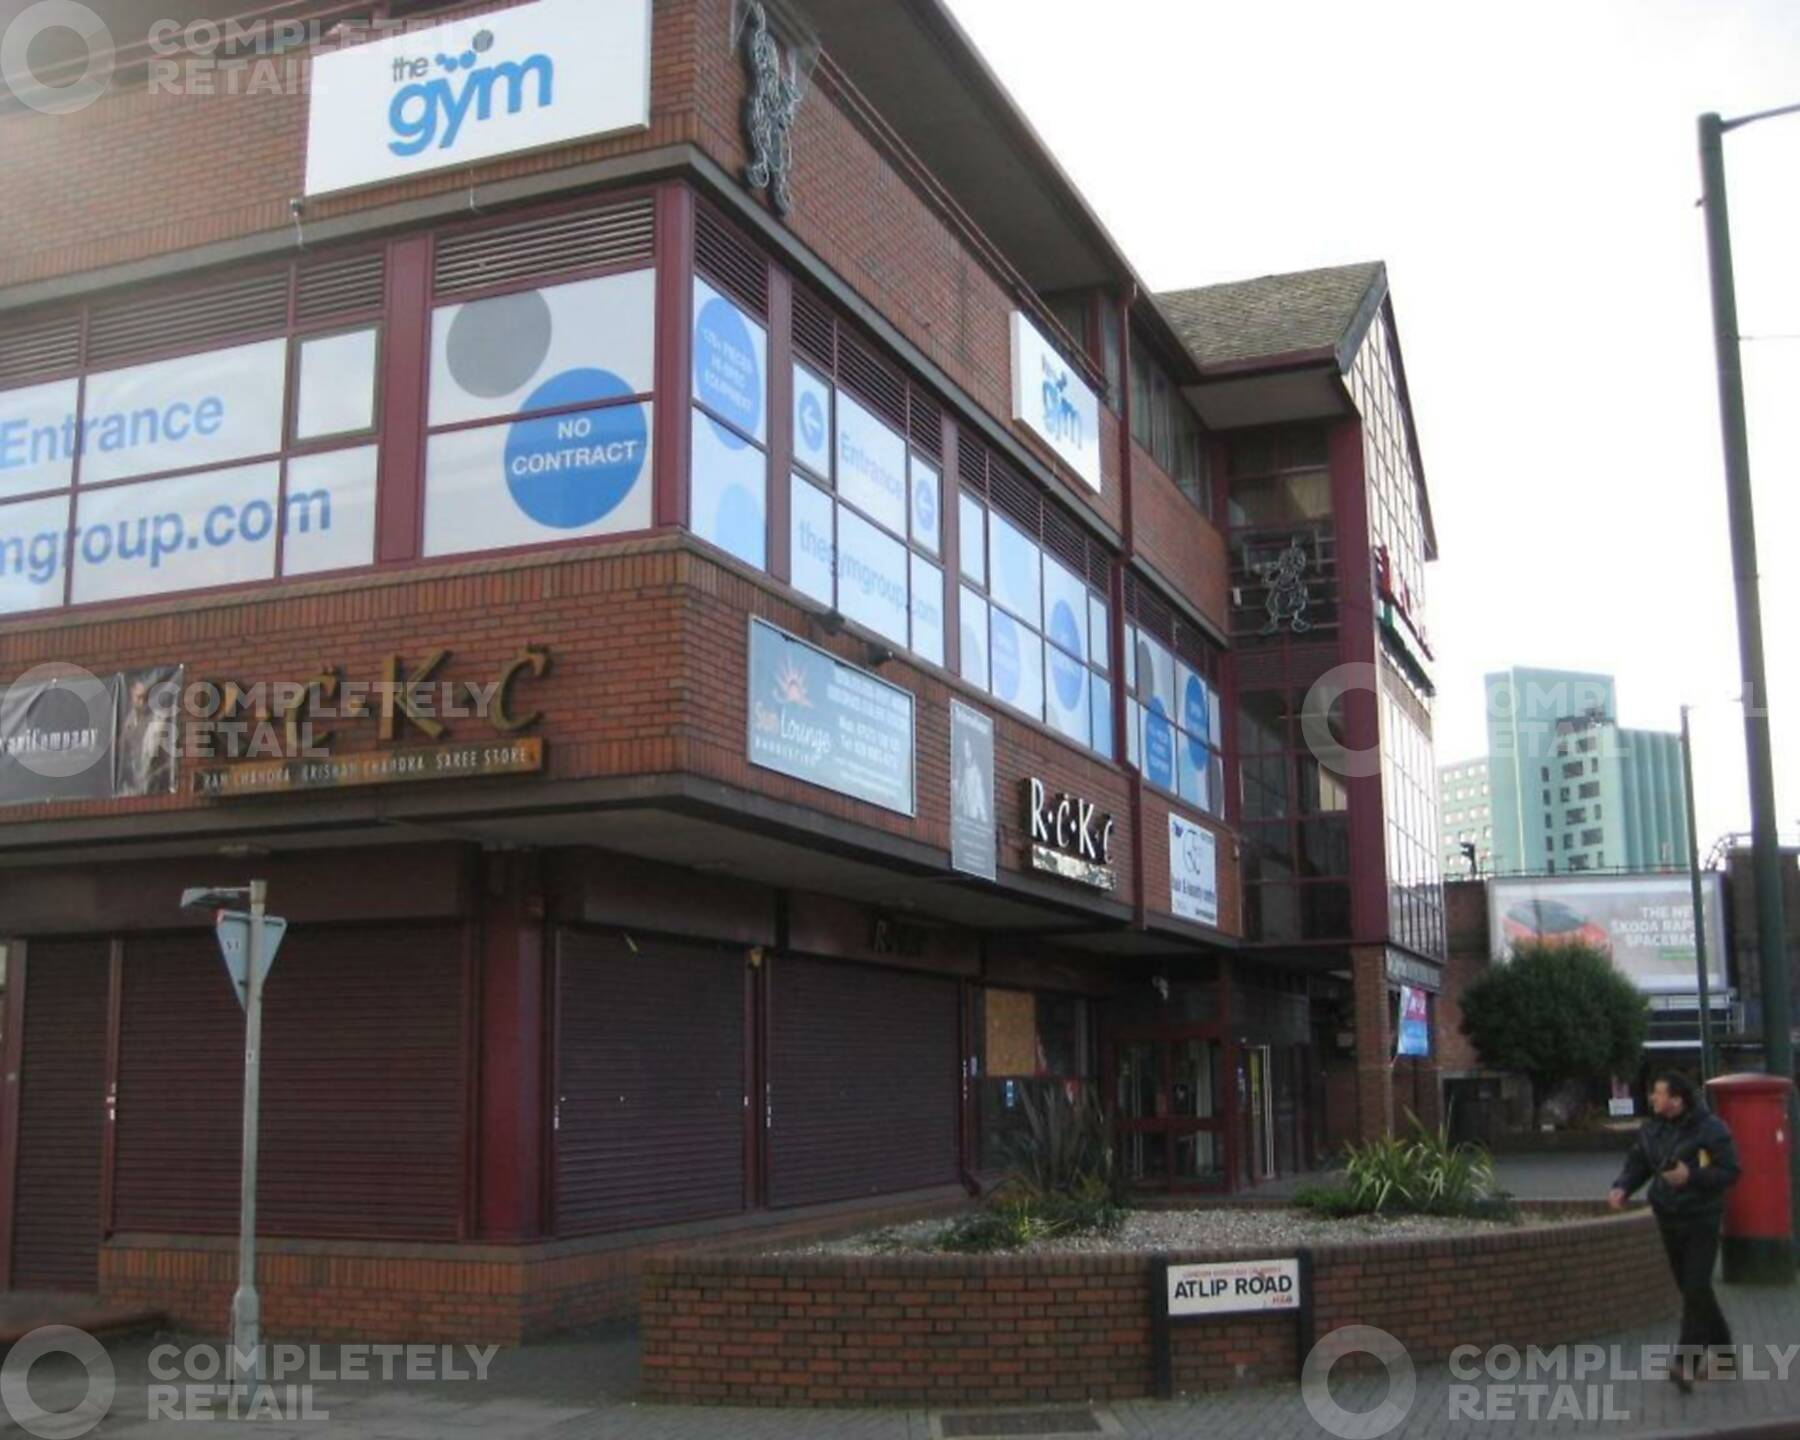 The Atlip Centre, 197 Ealing Road